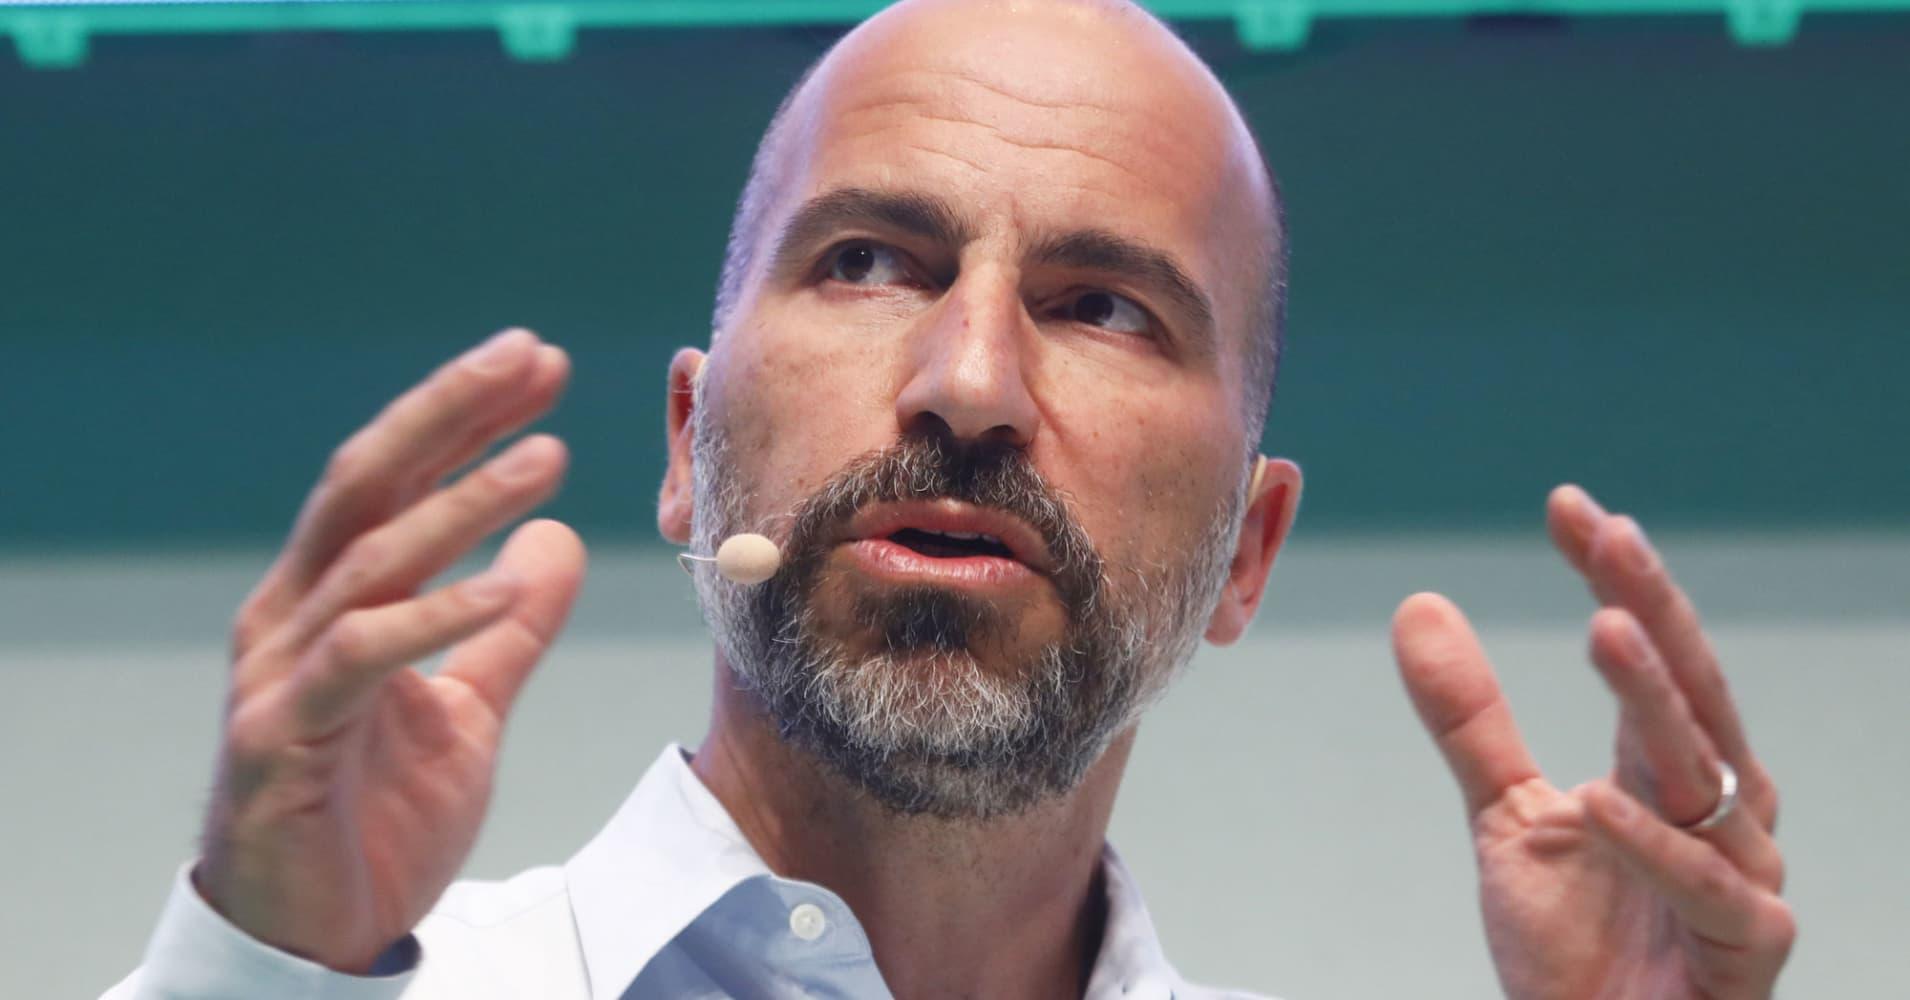 Dara Khosrowshahi, CEO of Uber, speaks at the 2018 NOAH conference on June 6, 2018 in Berlin, Germany.